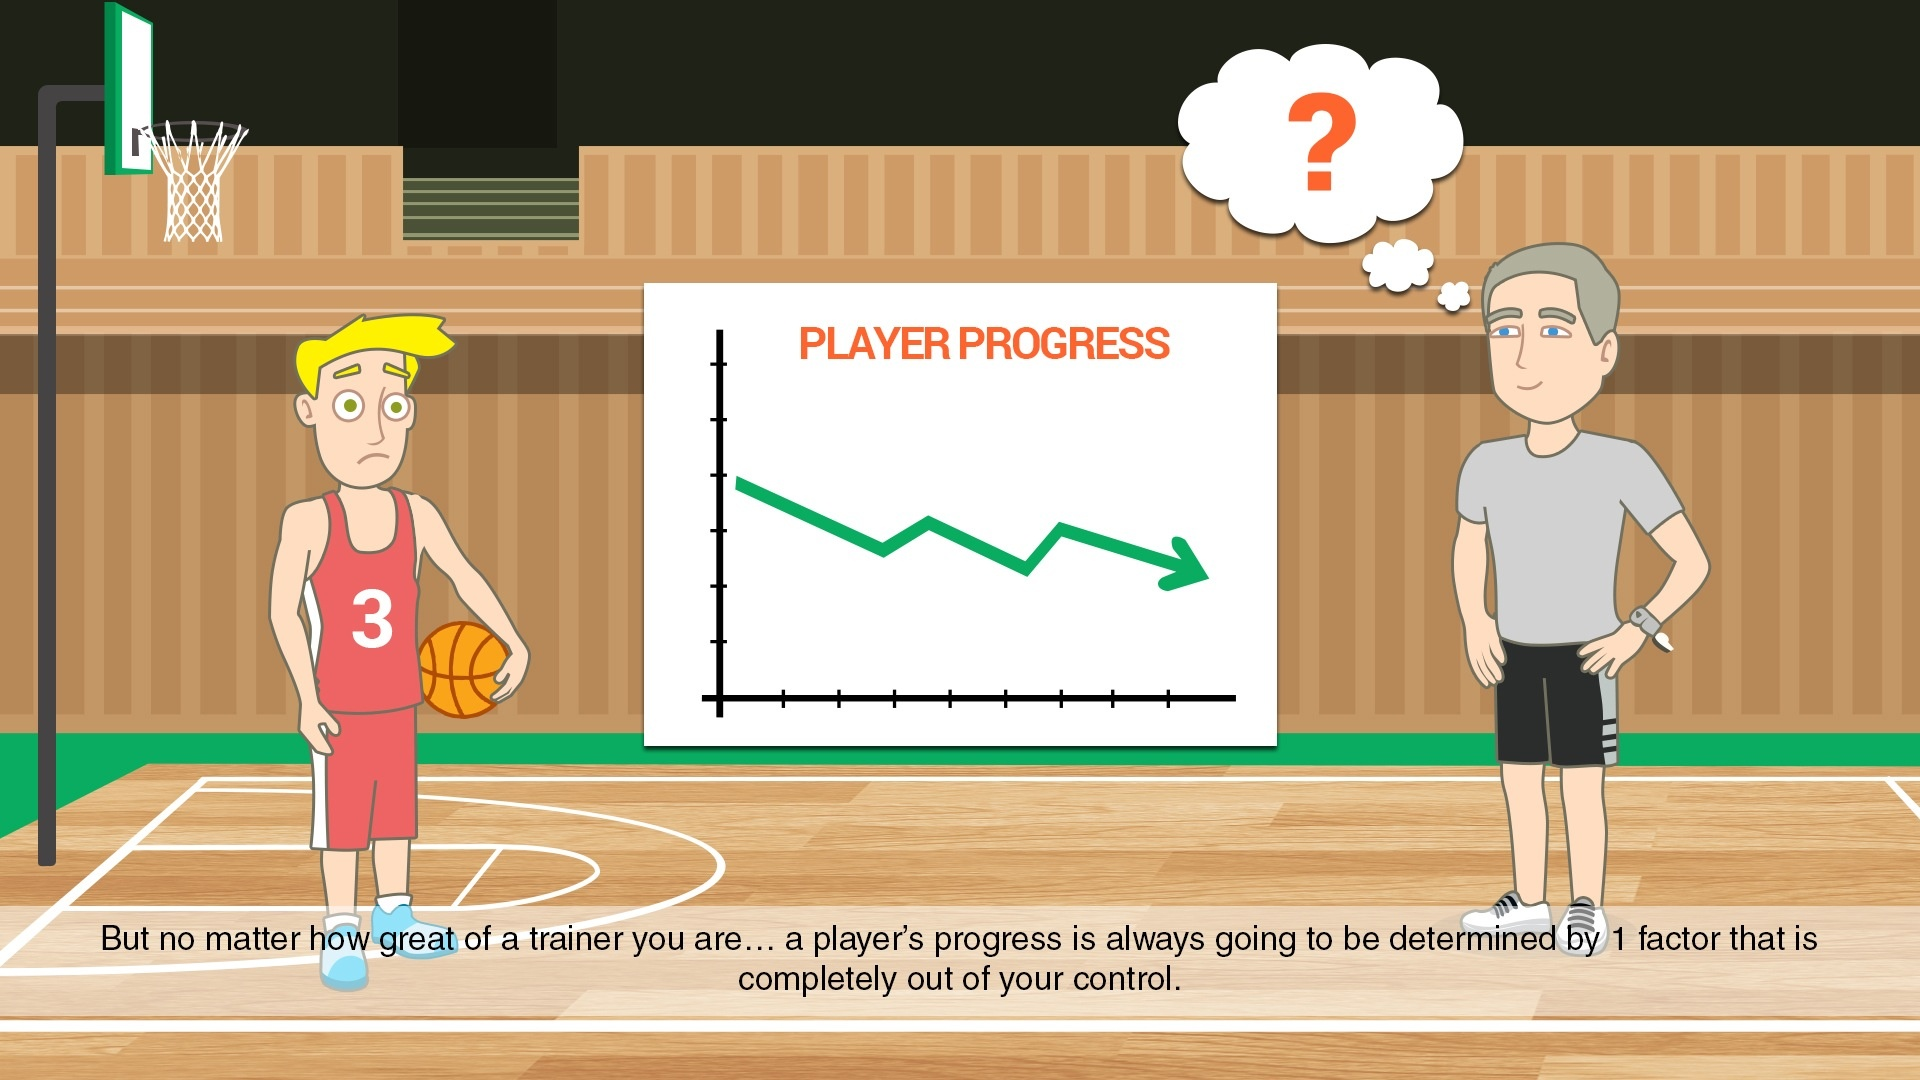 Video 3 - Player Progress Downward (1)